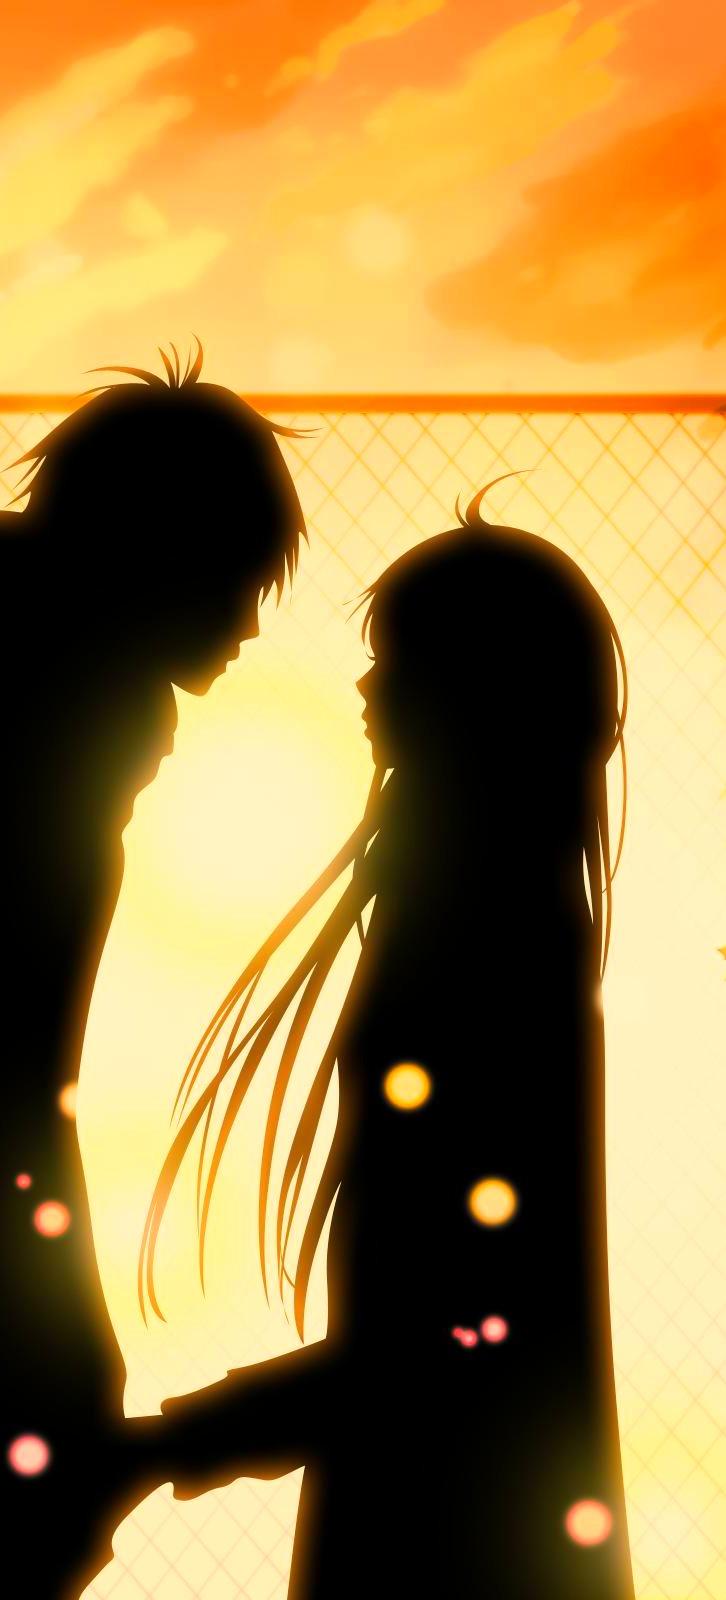 Cute Girl And Boy Hug Wallpaper Kimi Ni Todoke From Me To You Zerochan Anime Image Board